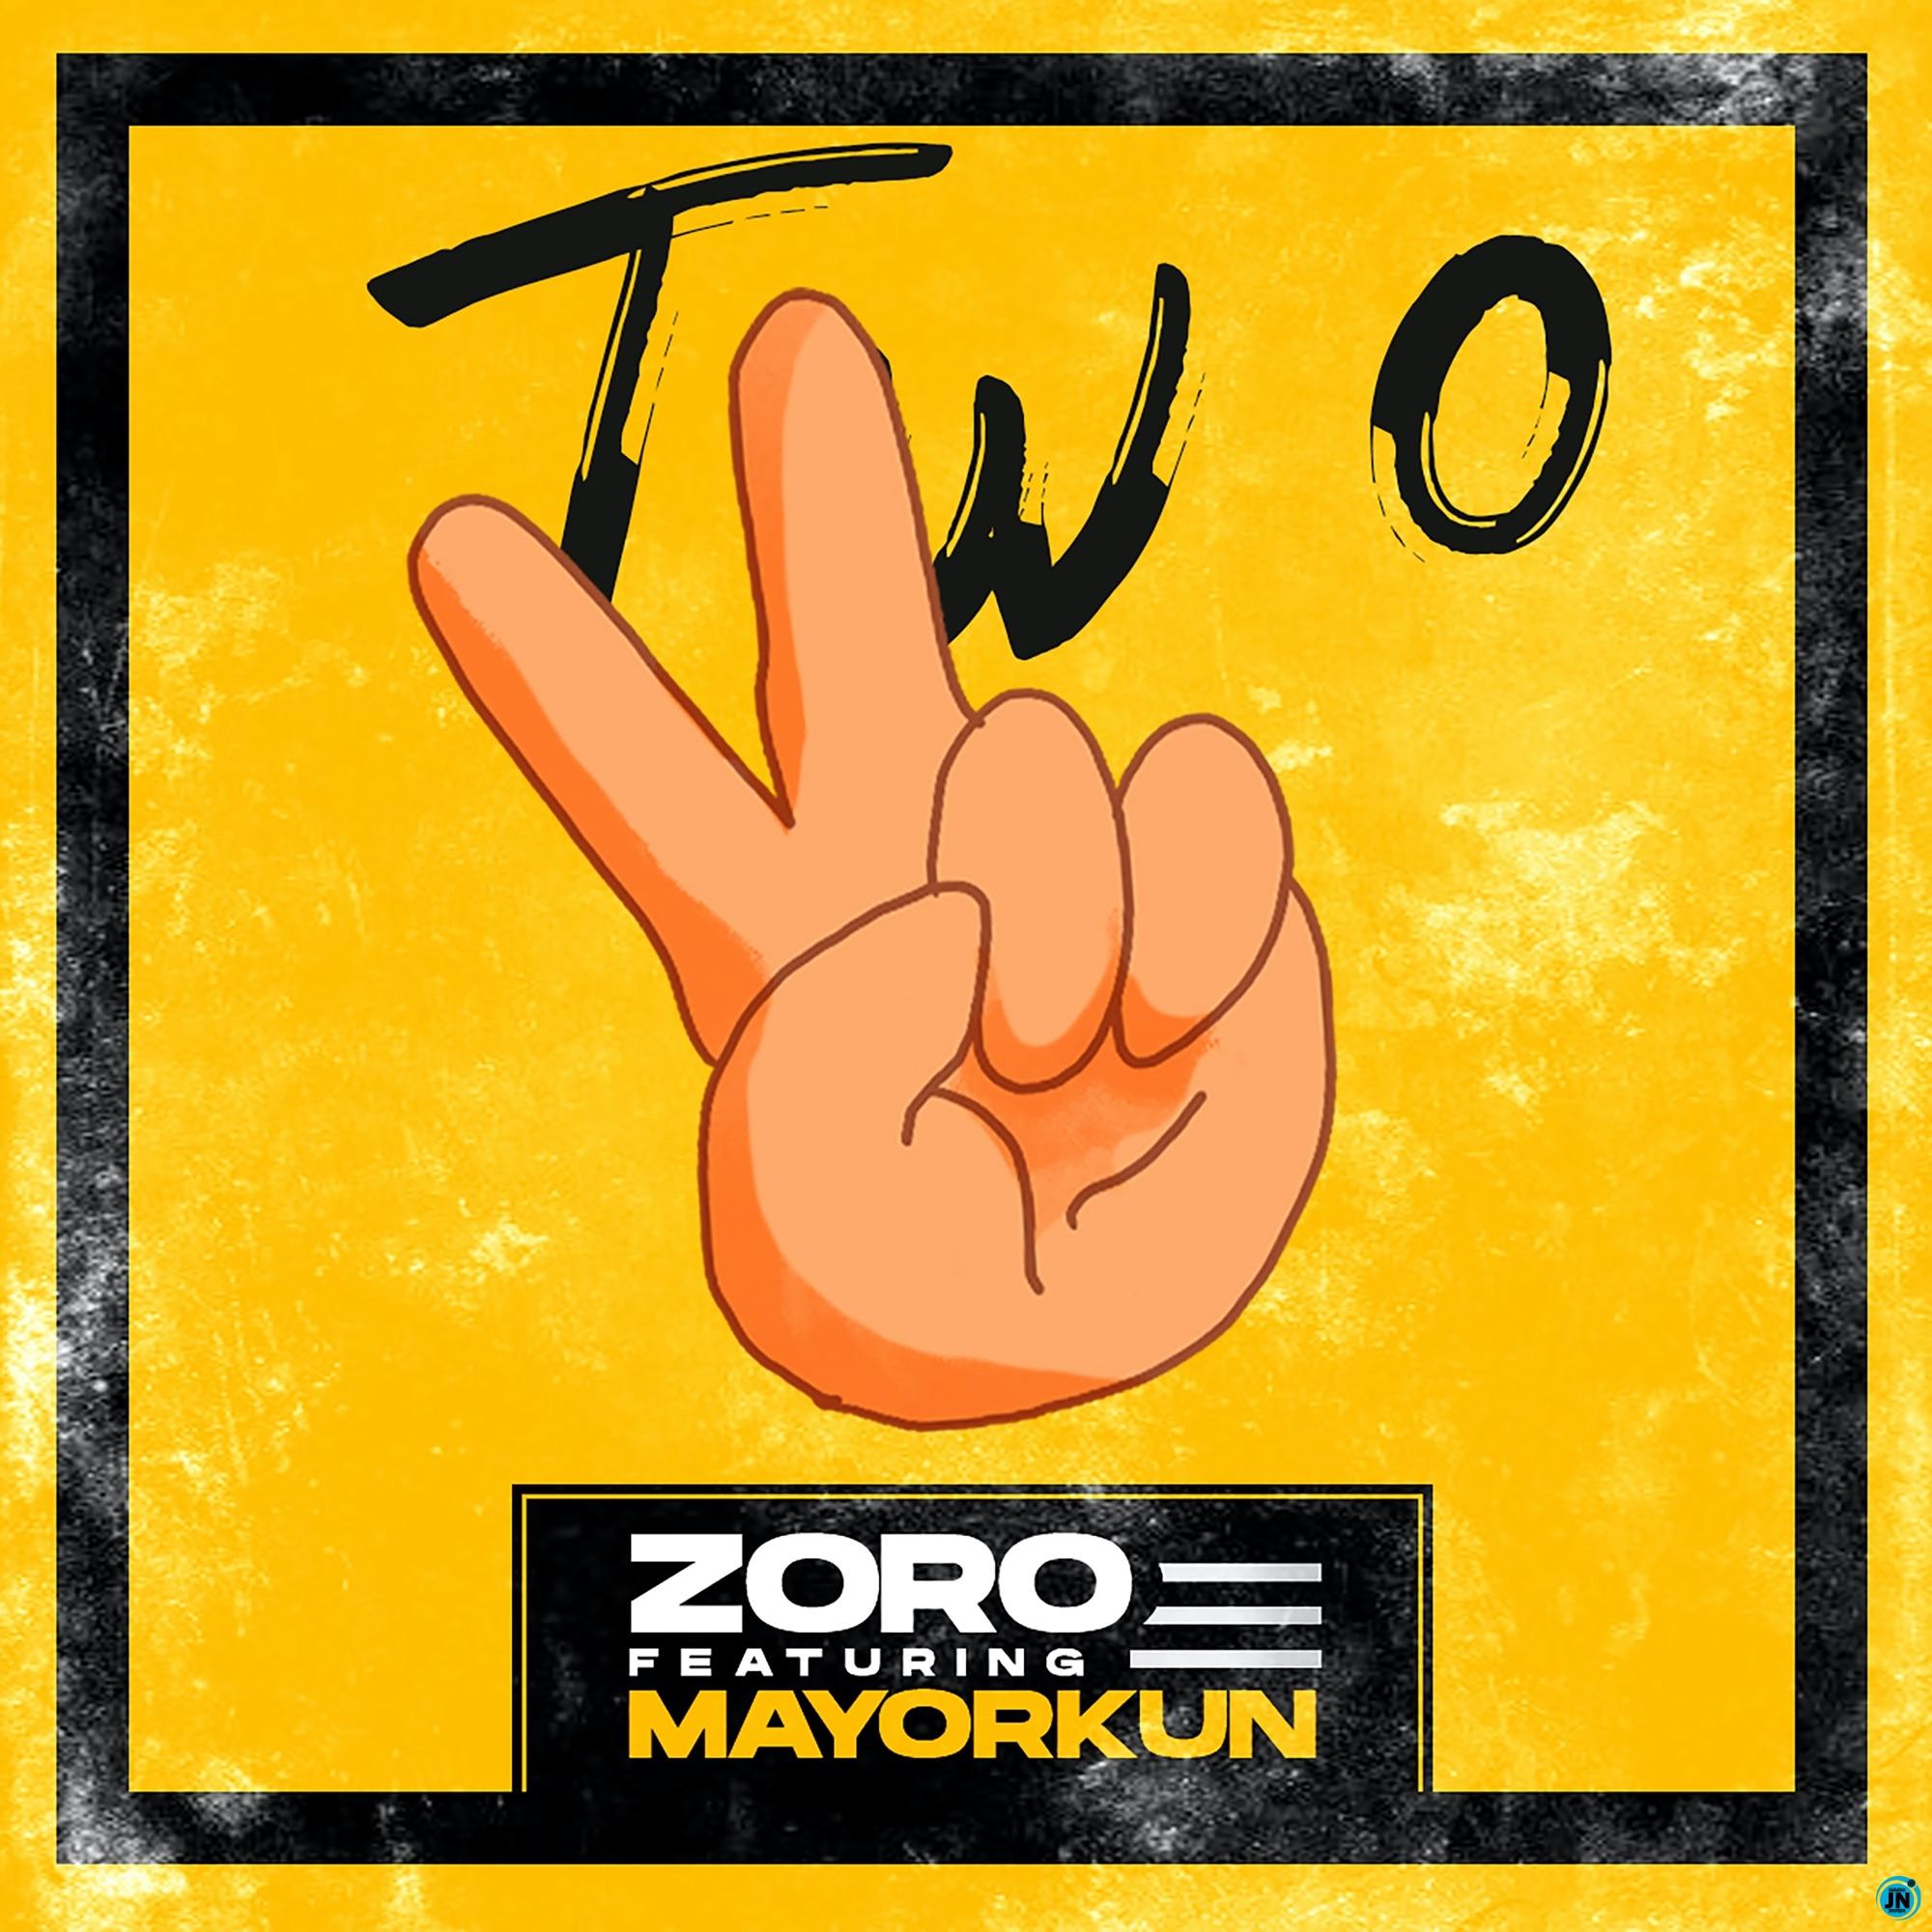 Zoro - Two ft. Mayorkun